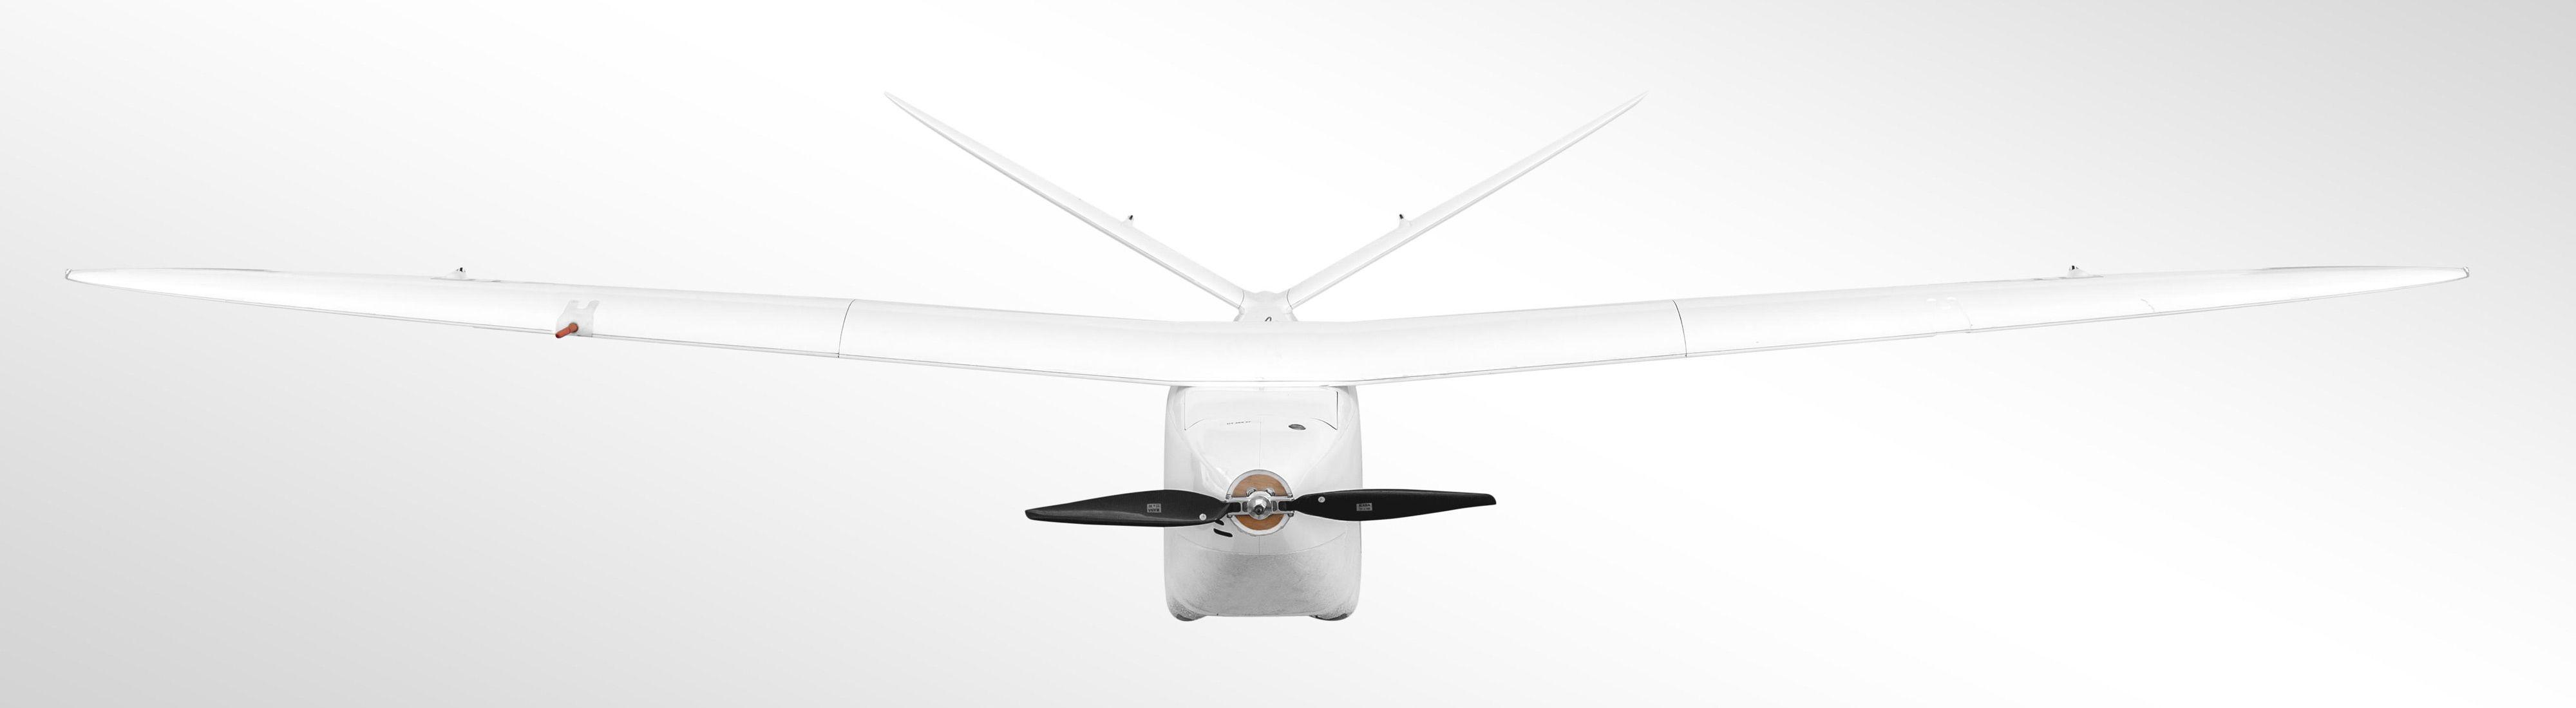 UAV drone Delair-Tech front